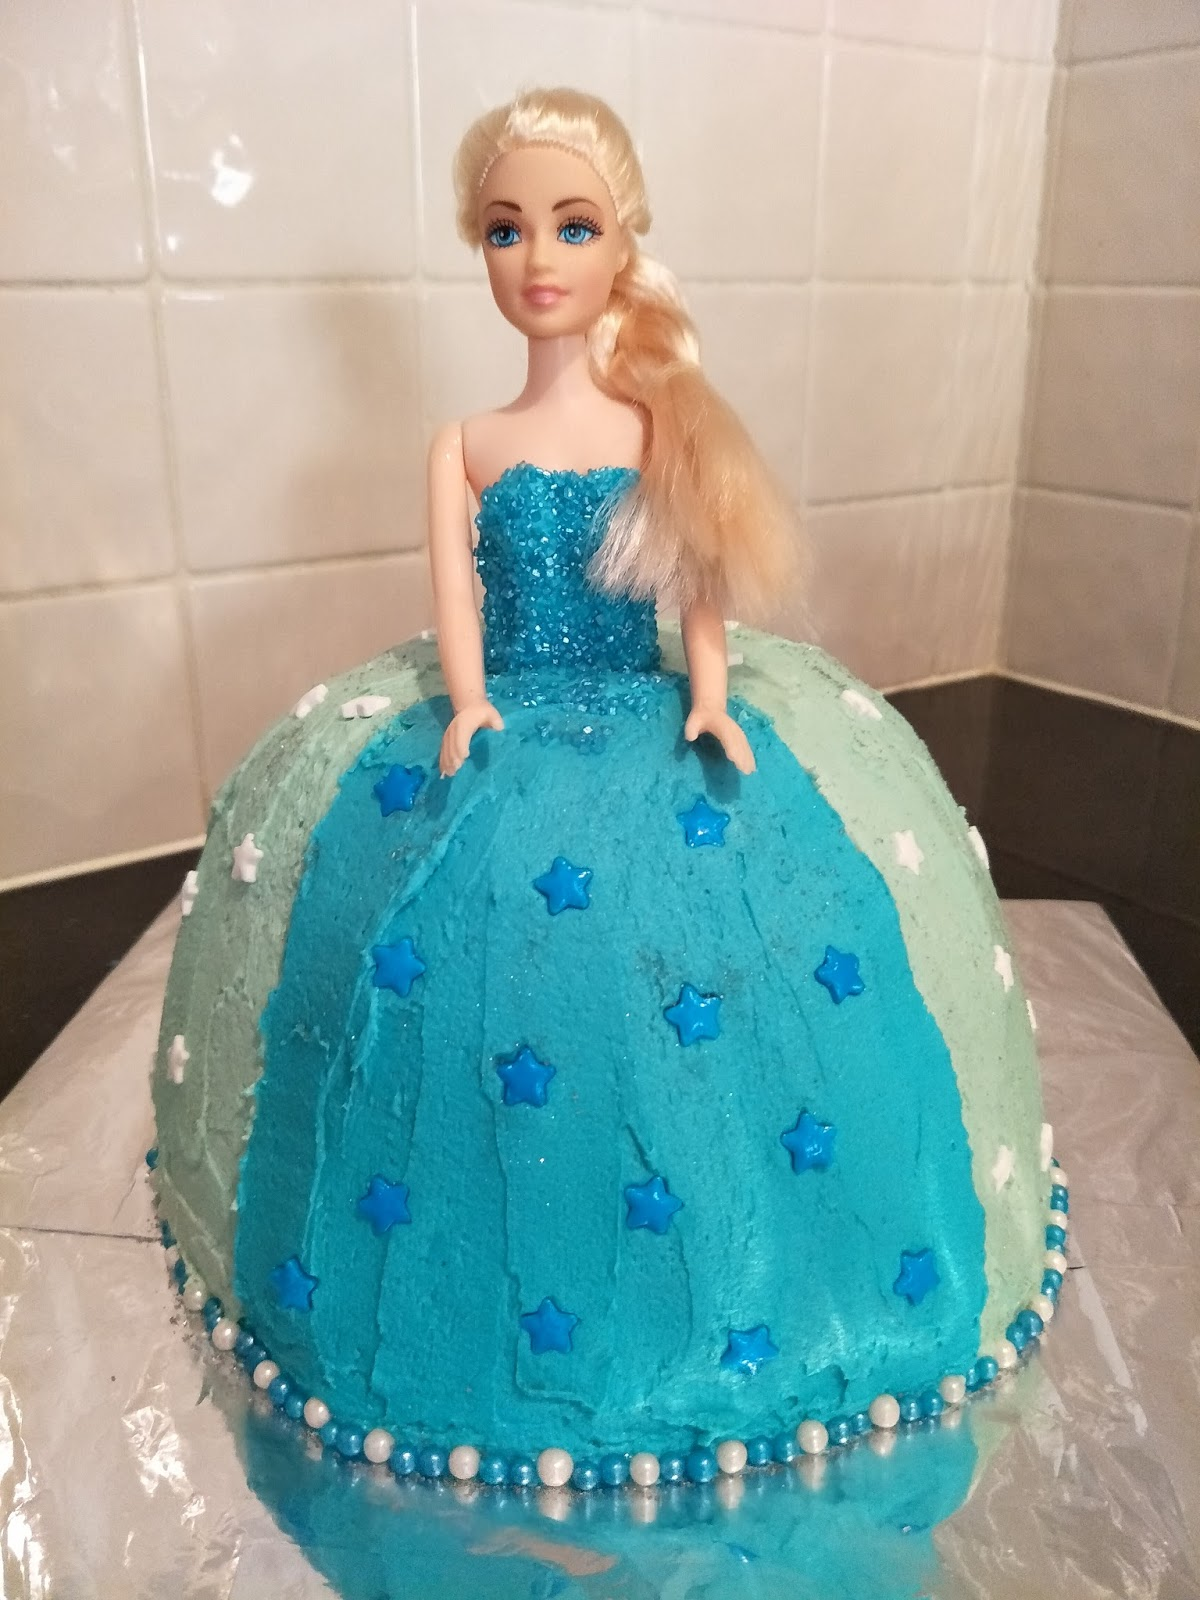 Fabulous Elsa Frozen Birthday Cake Funny Birthday Cards Online Fluifree Goldxyz